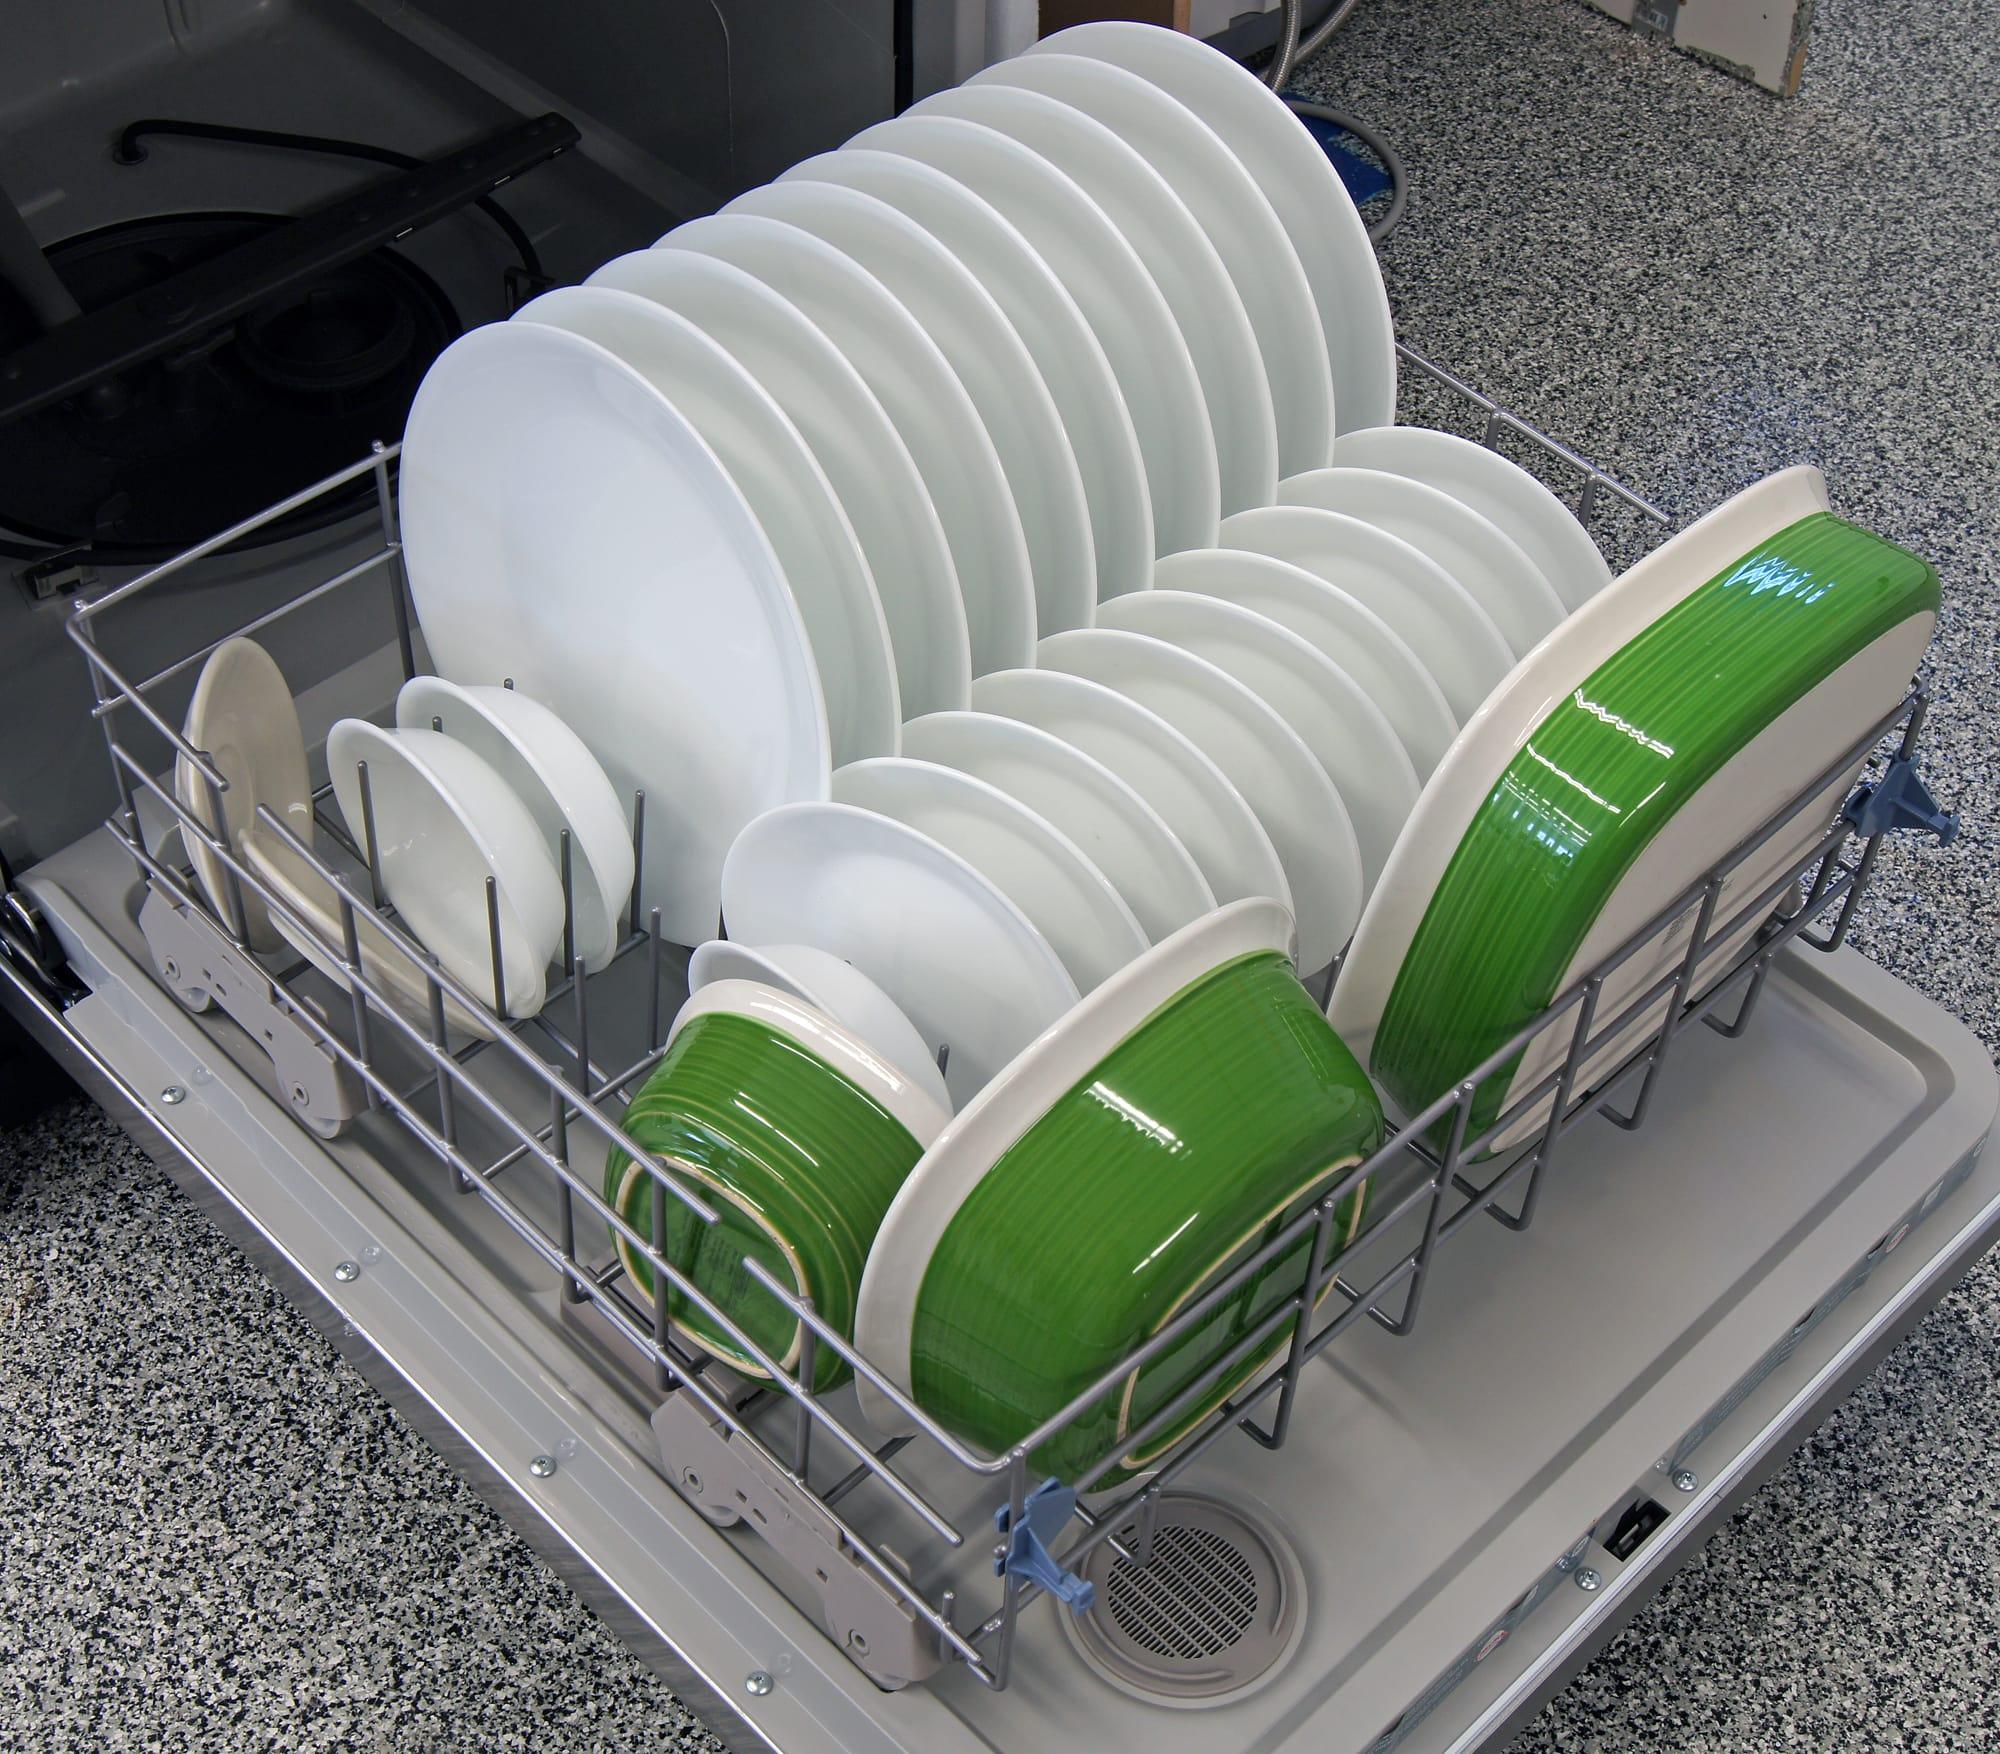 Whirlpool WDF530PAYM bottom rack capacity